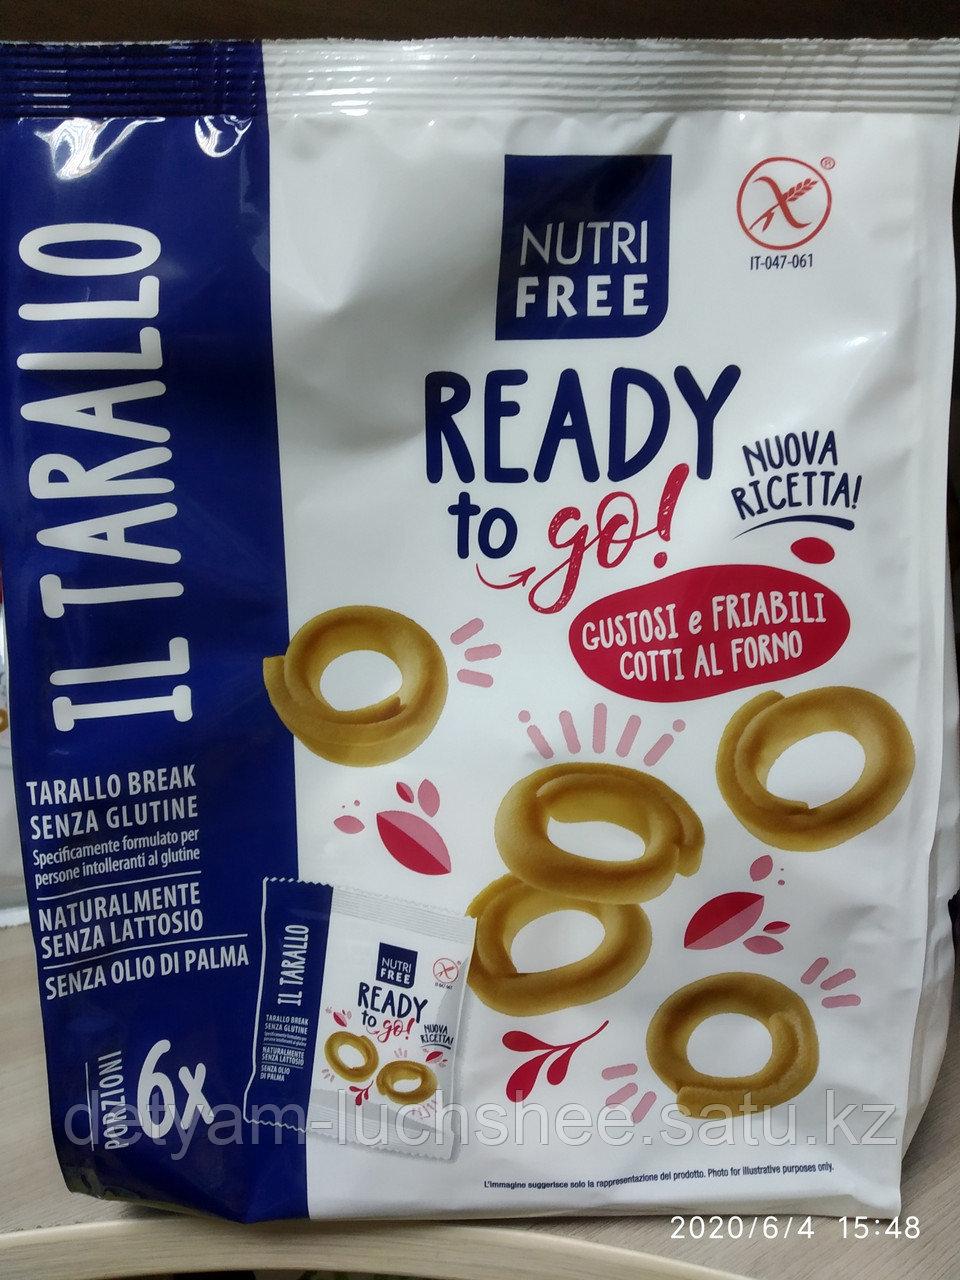 Nutri Free Сушки (Tarallo break) 180 грамм